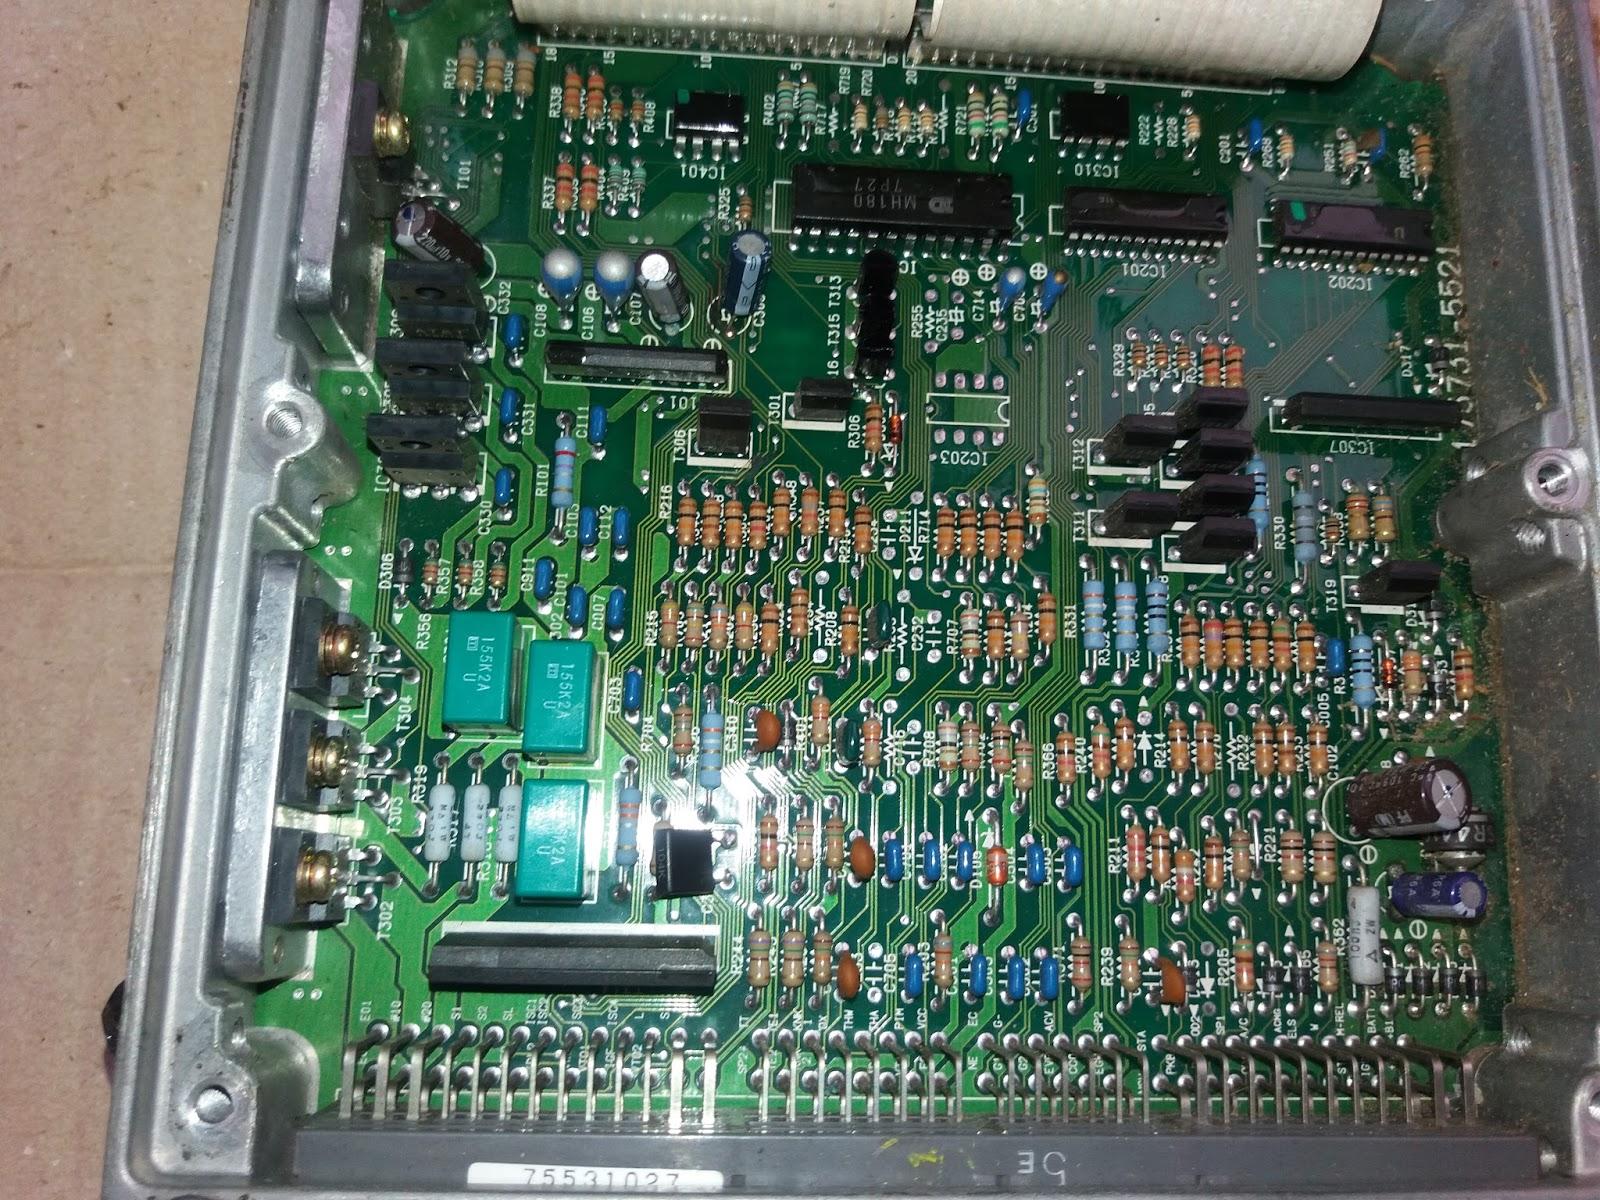 Isuzu Rodeo Ignition Wiring Diagram Moreover Toyota 22re Wiring